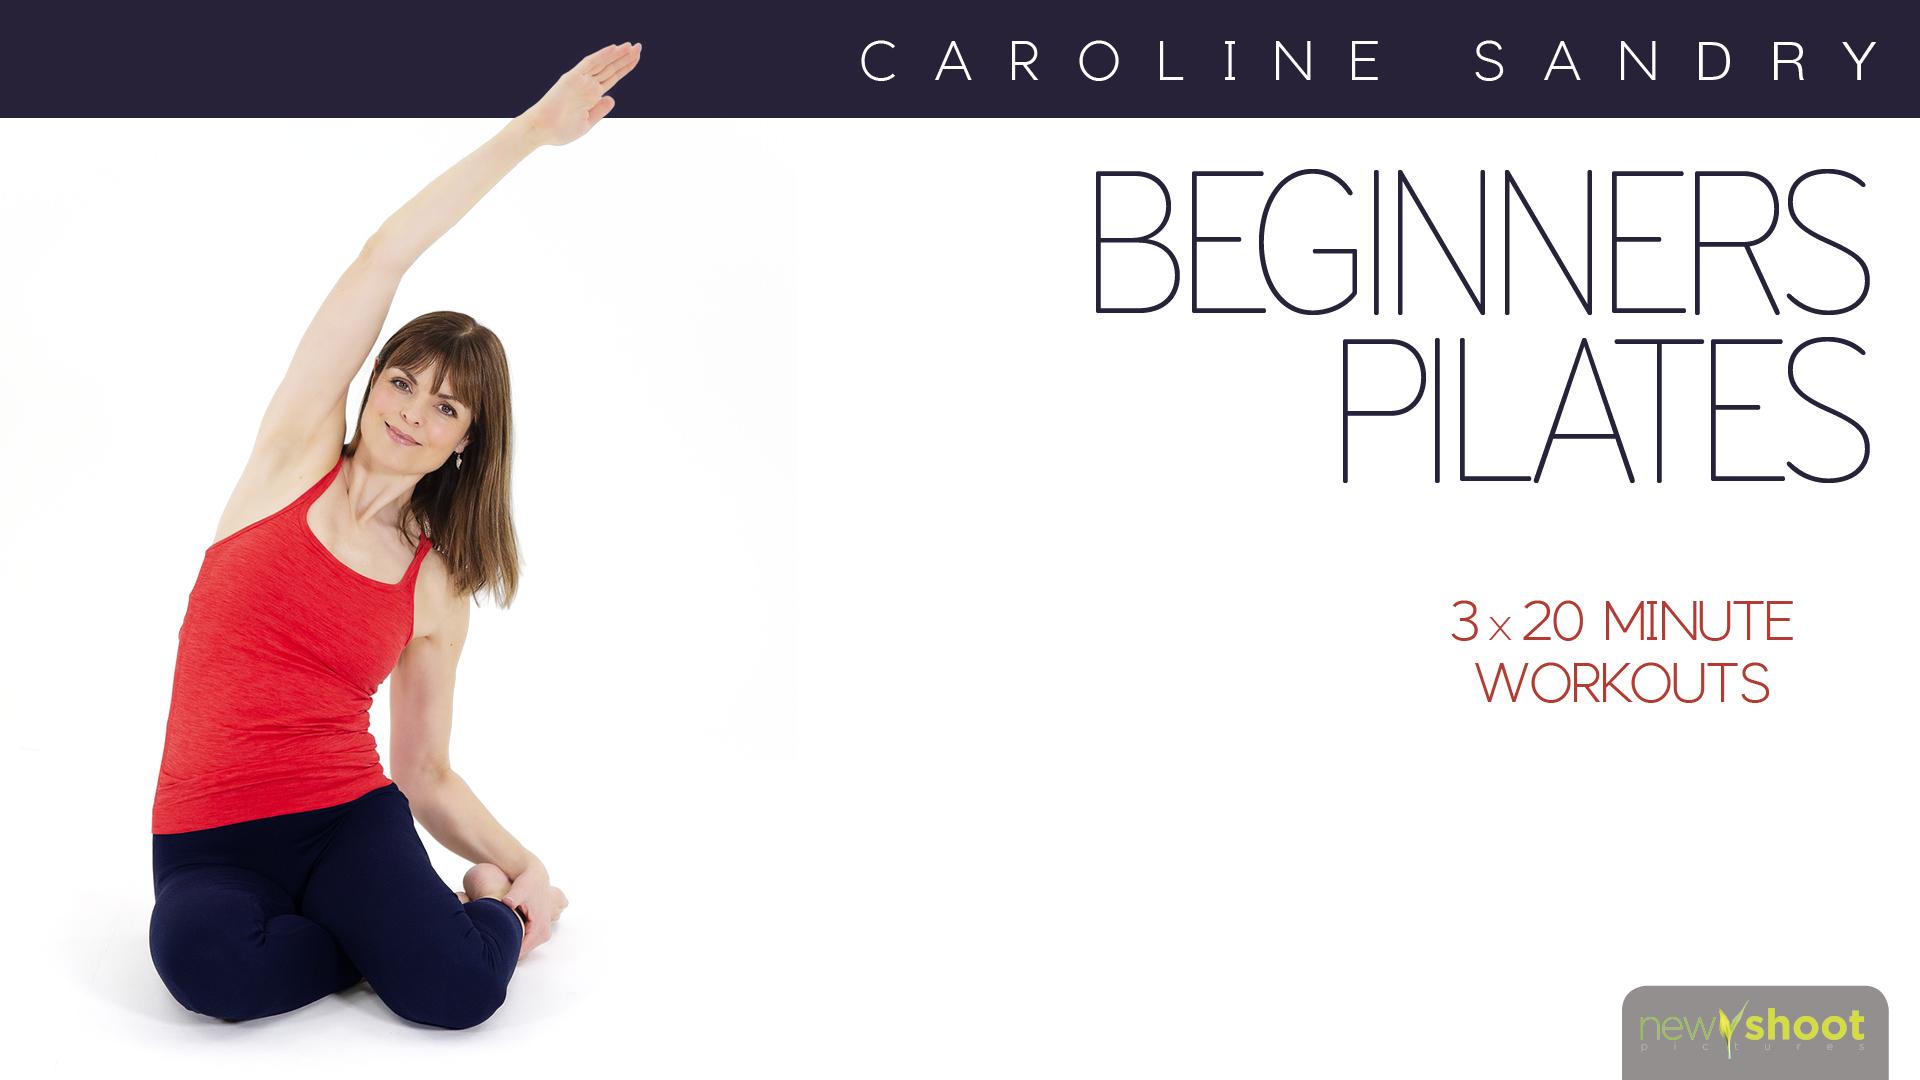 Beginners Pilates Caroline Sandry